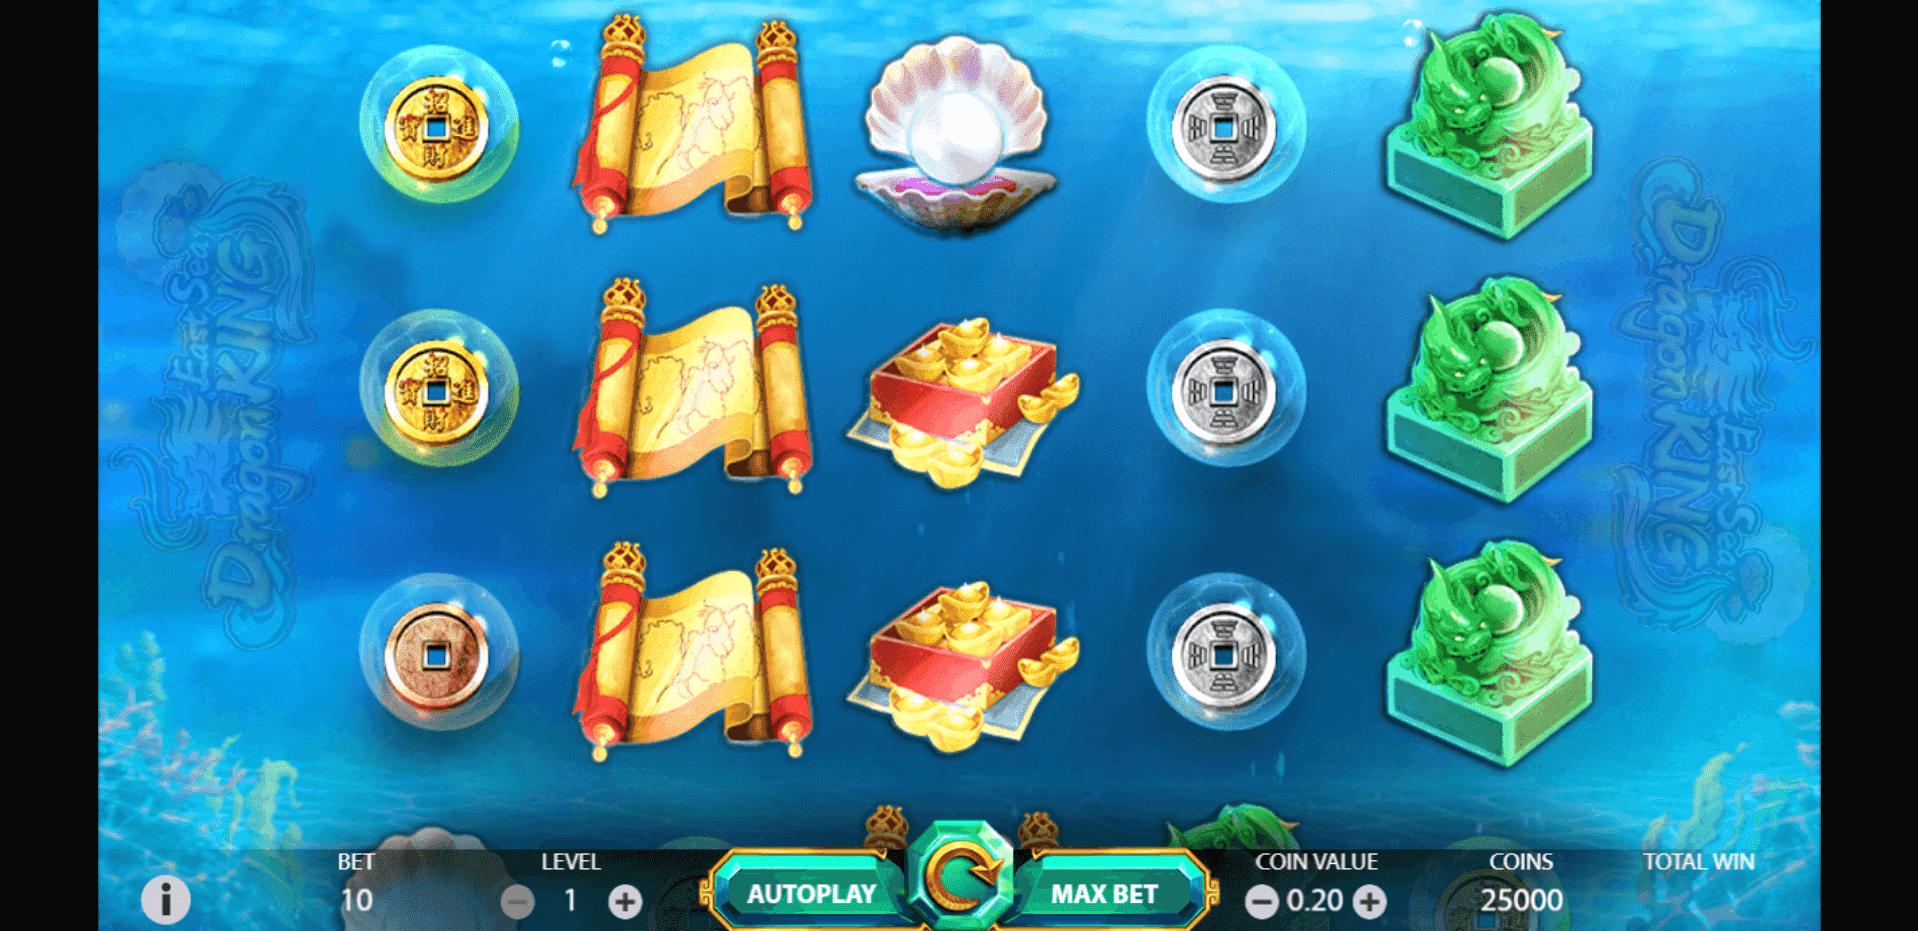 East Sea Dragon King slot machine screenshot